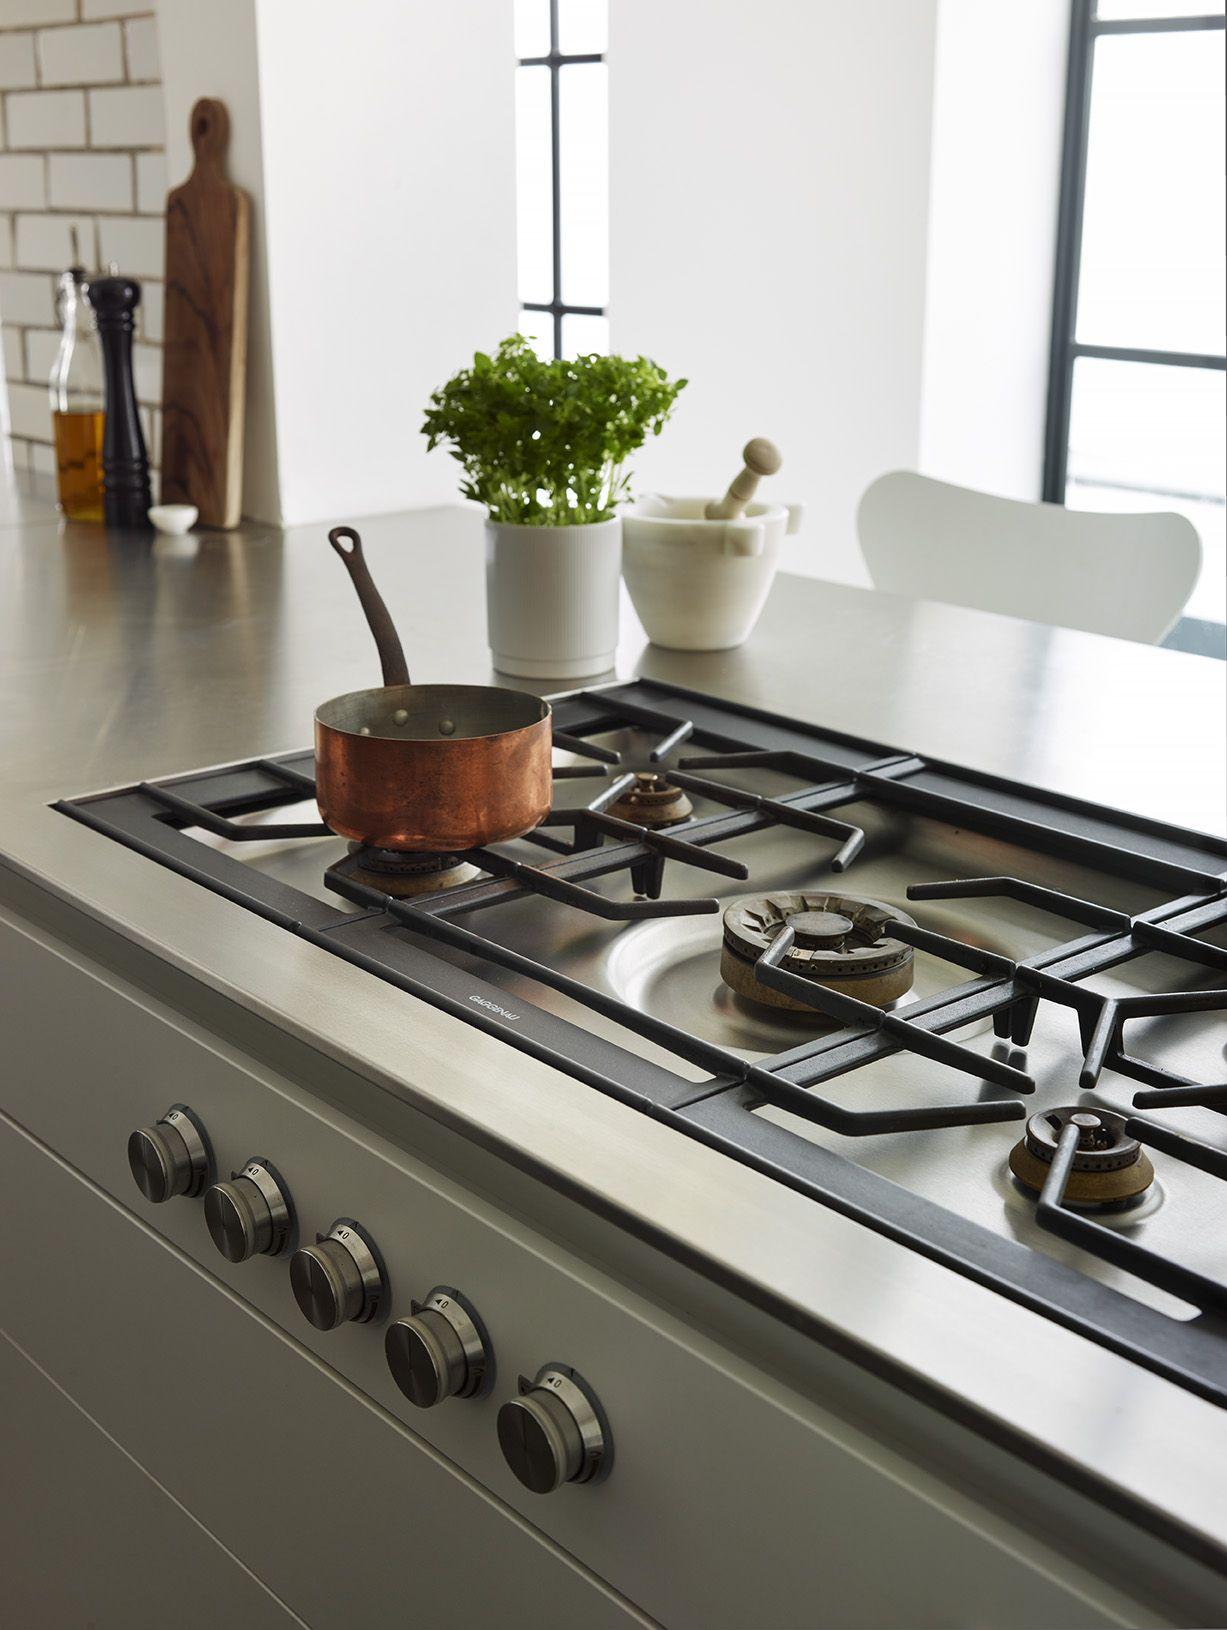 stylish hob gaggenau flush gas hob with inset controls in the kitchen units kitchen design. Black Bedroom Furniture Sets. Home Design Ideas